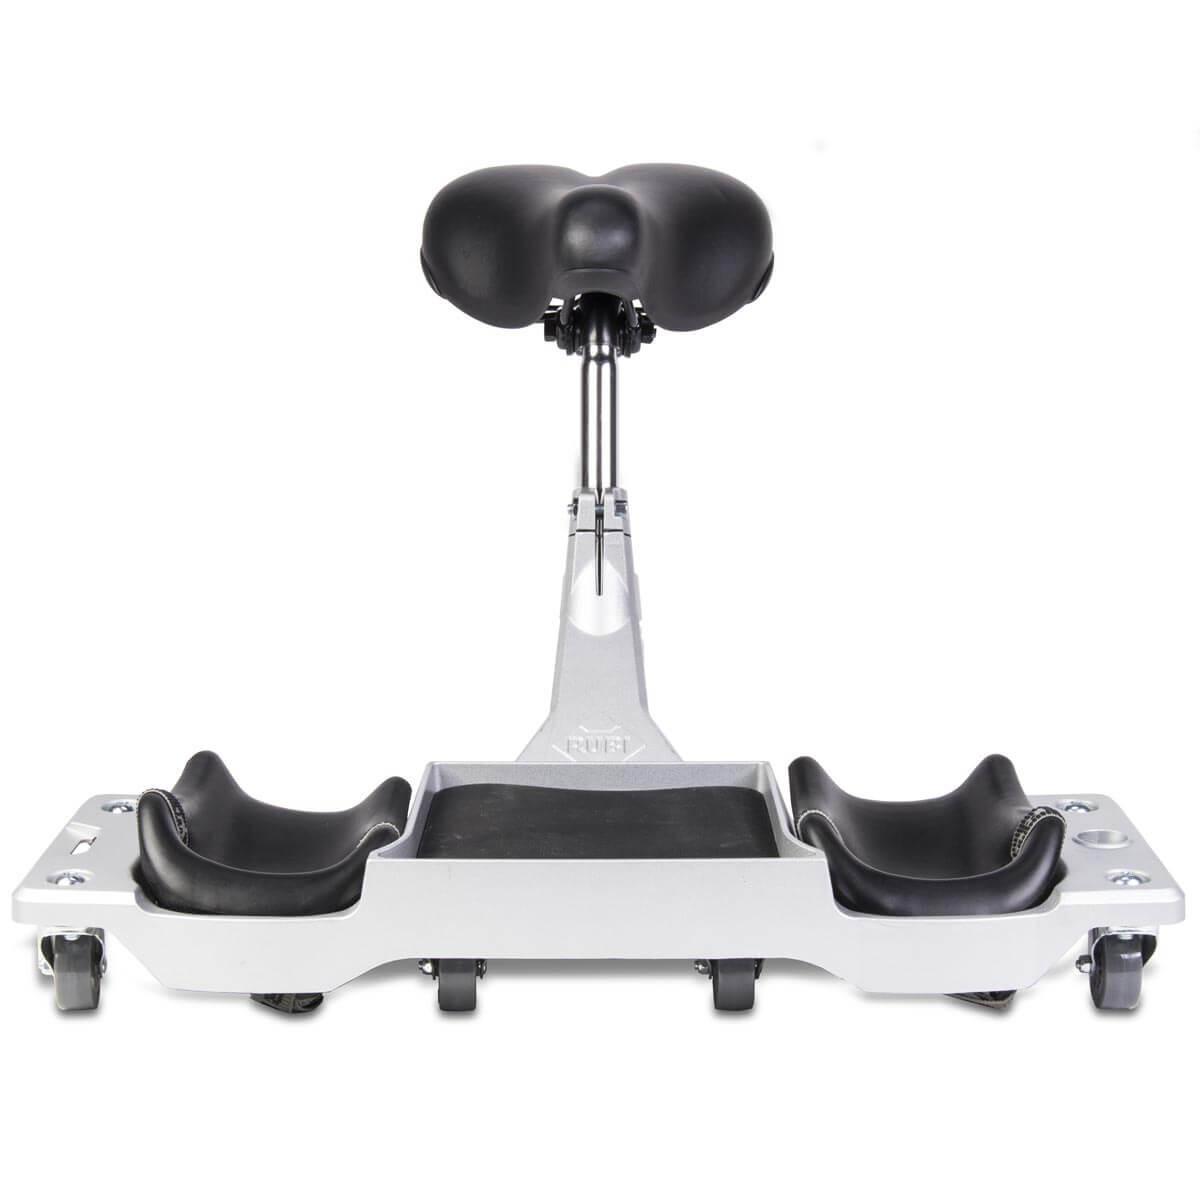 Rubi SR1 Ergonomic Seat tilling